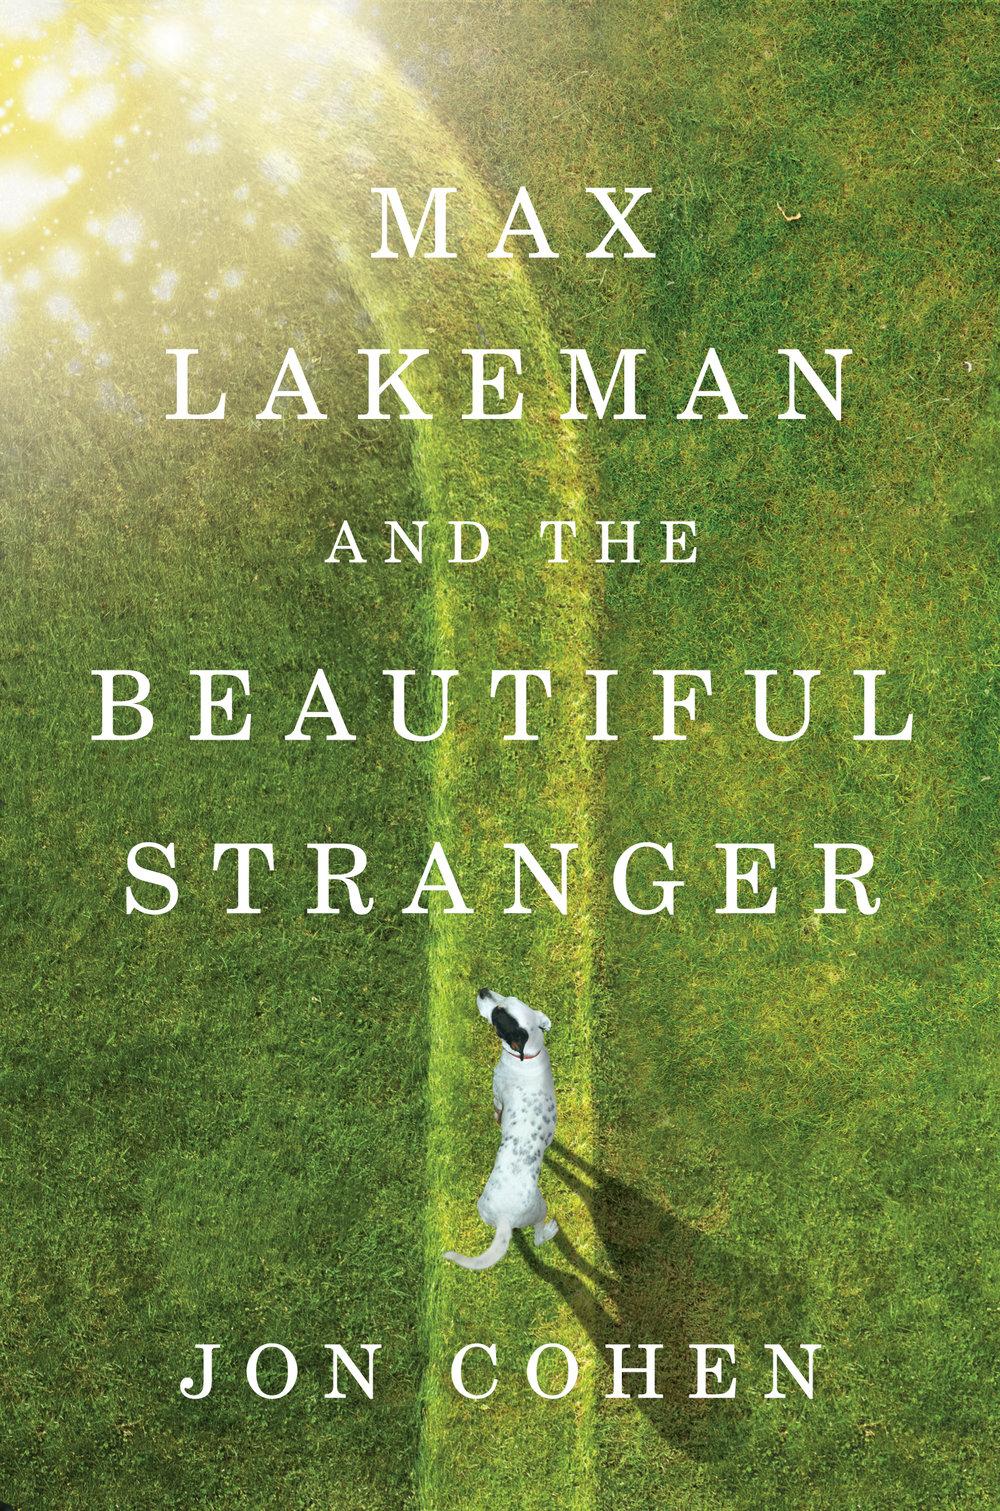 MAX LAKEMAN AND THE BEAUTIFUL STRANGER.jpg